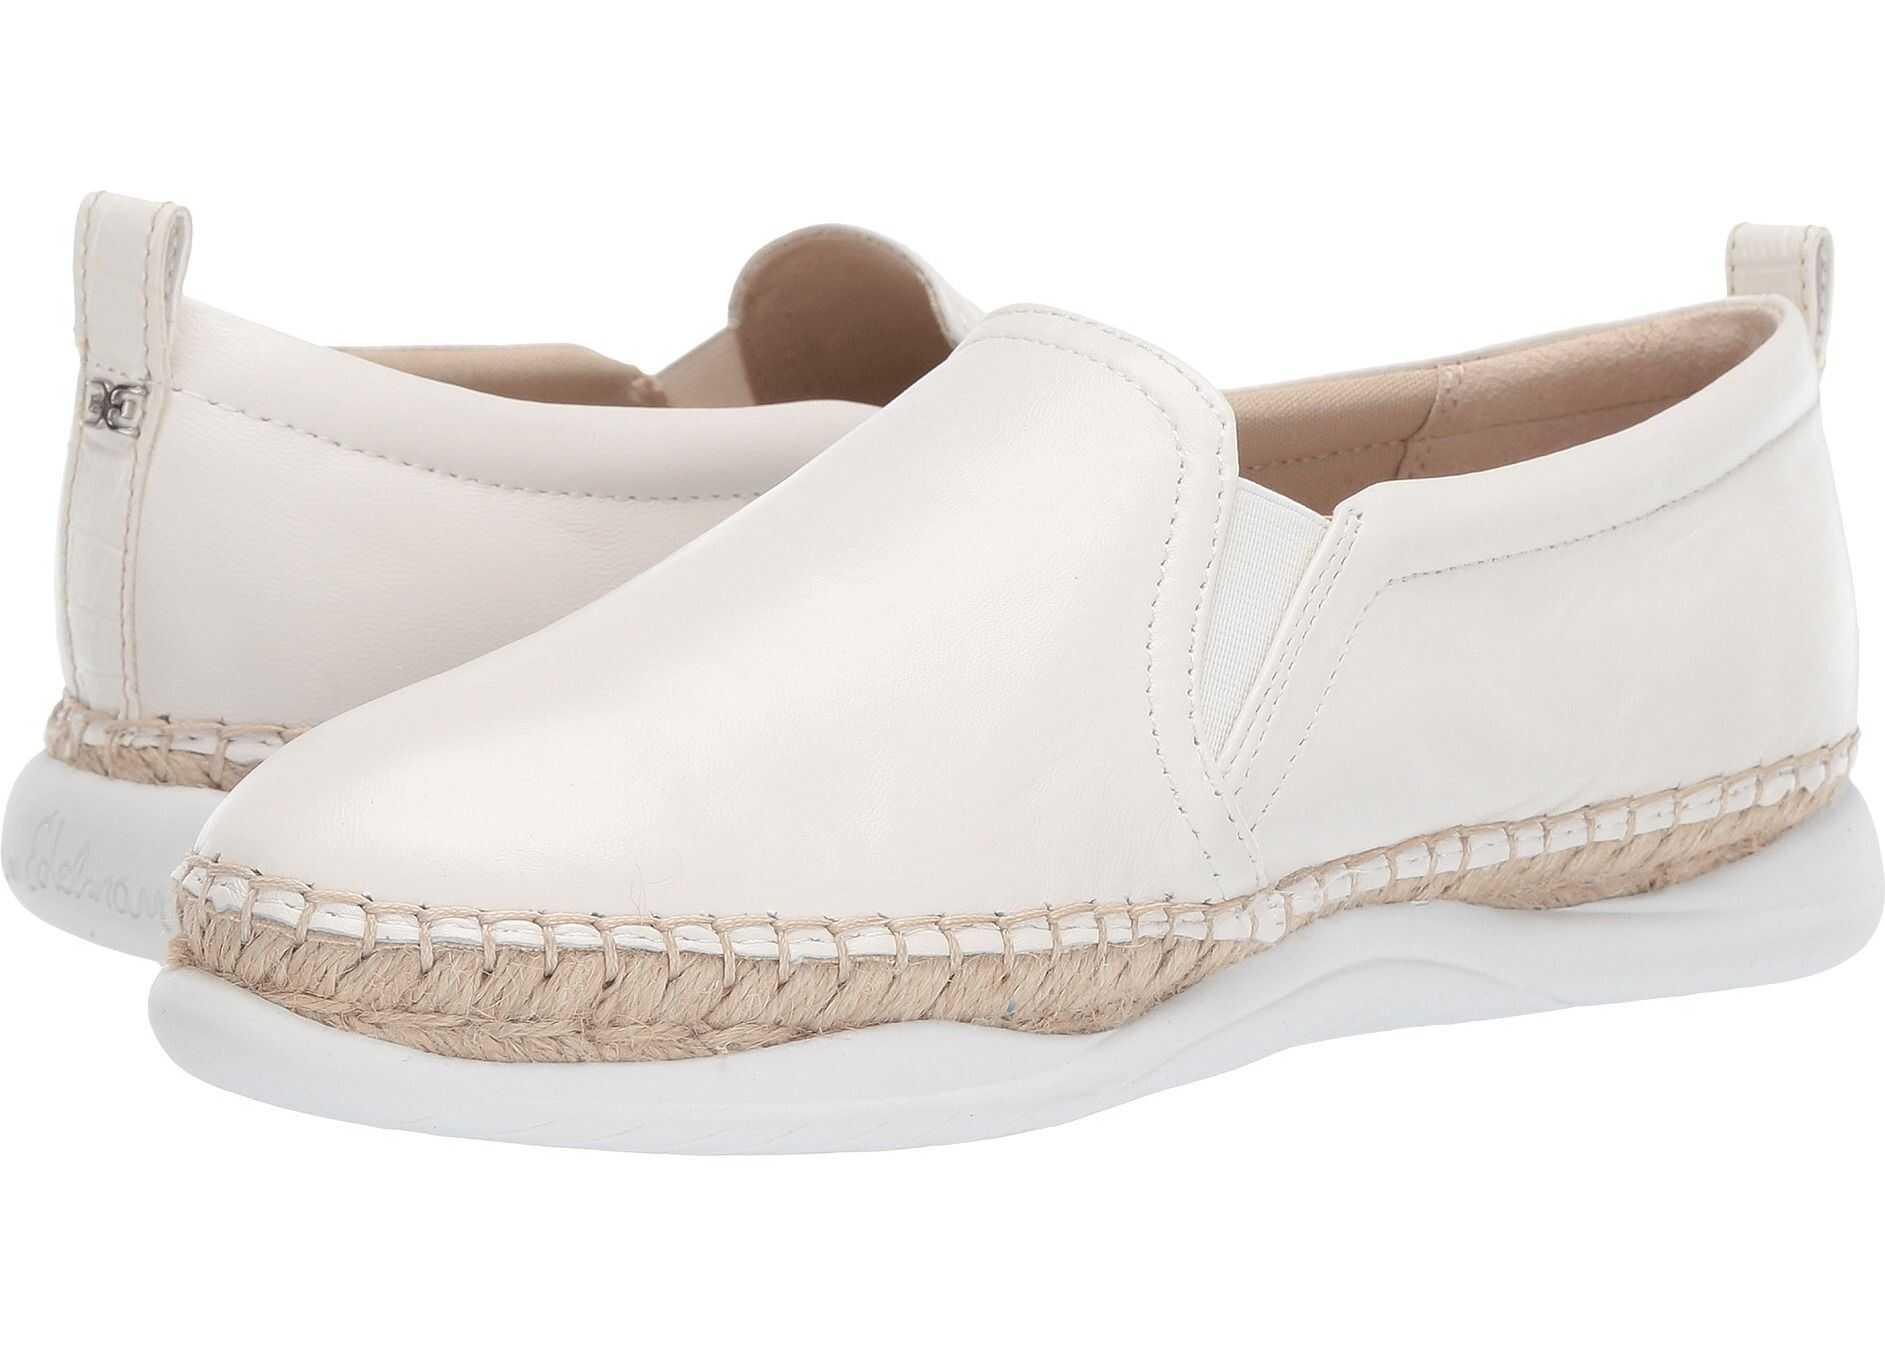 Sam Edelman Kassie Bright White Nappa Verona Leather